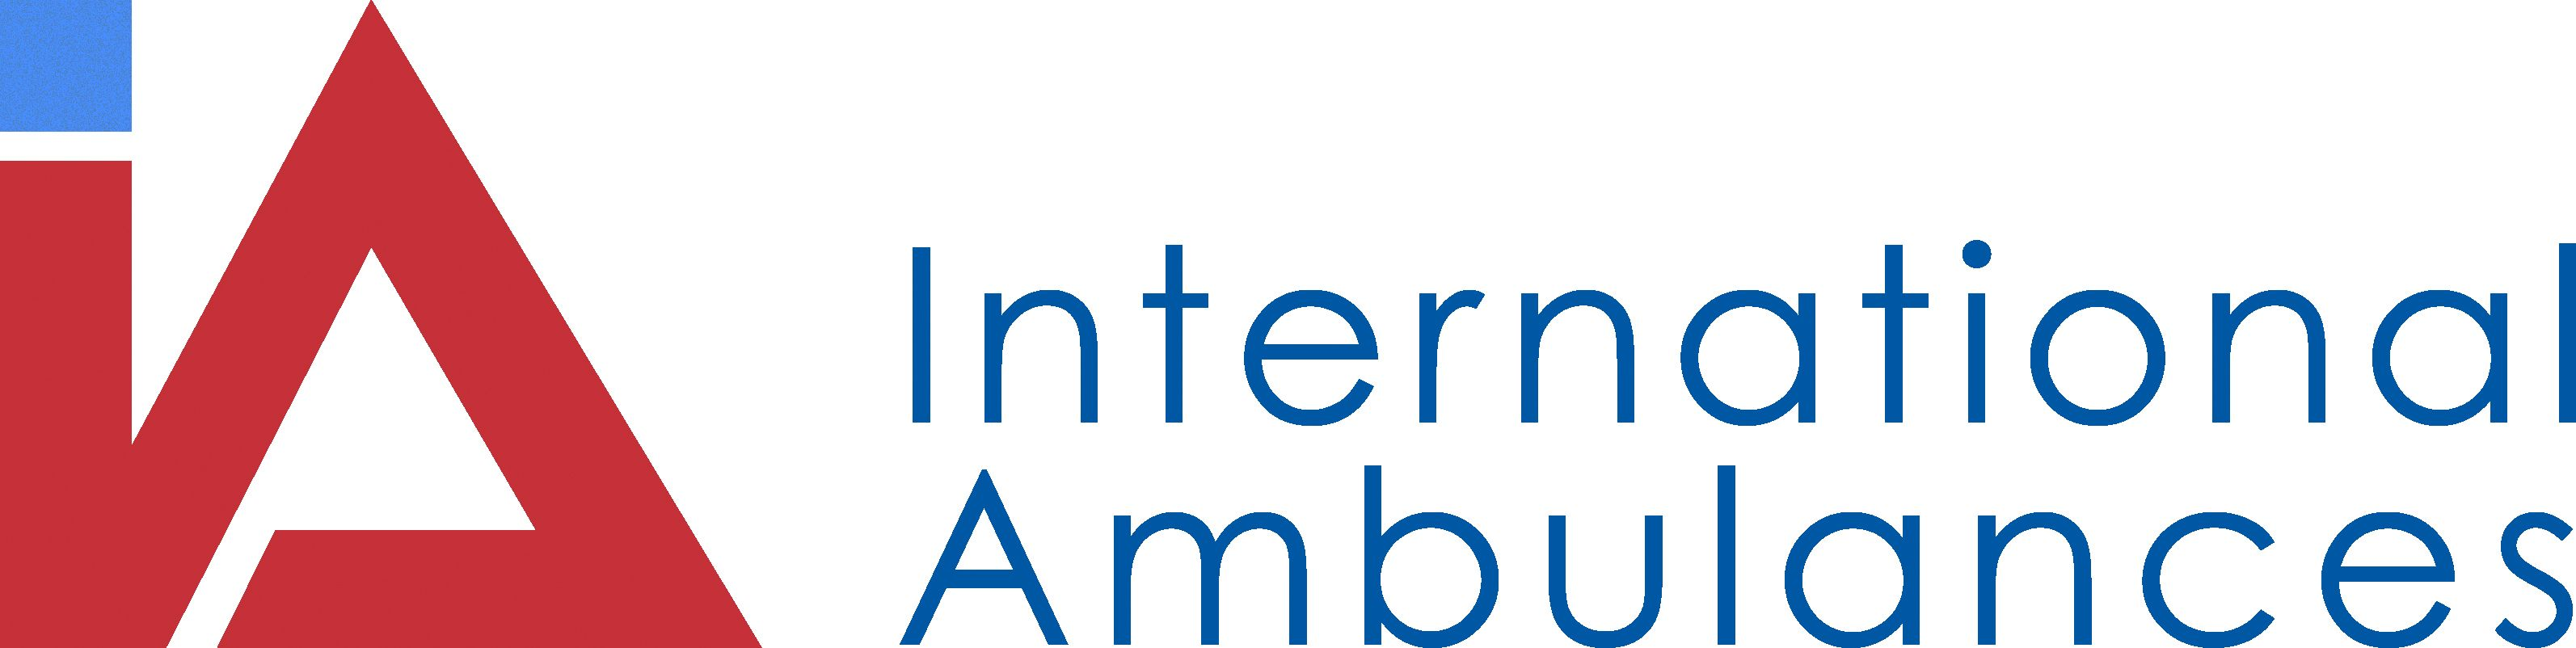 International Ambulances